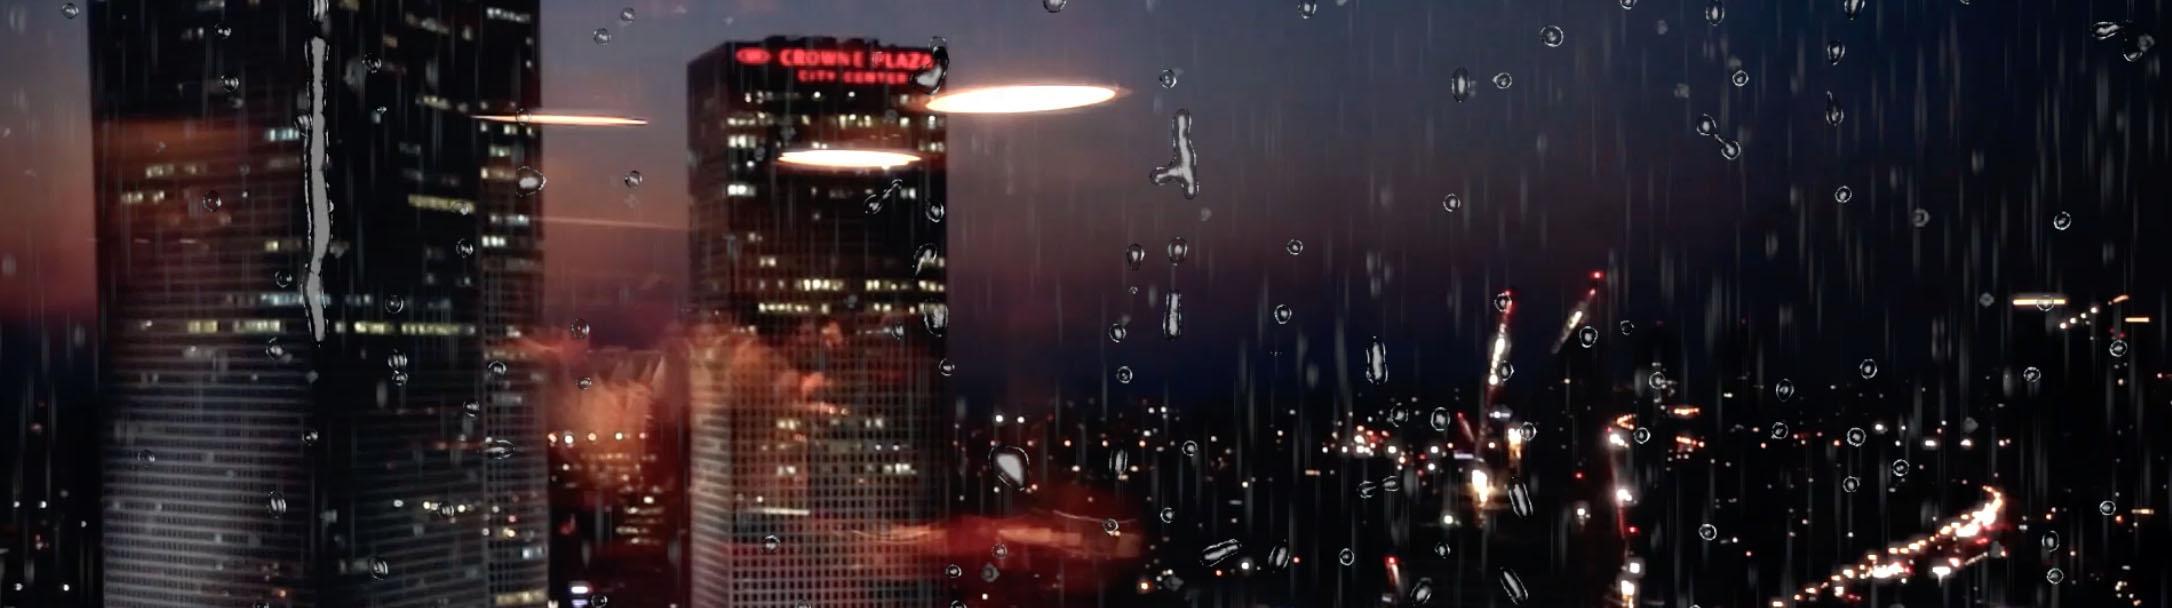 Rain drops - Droping Rain on transparent background